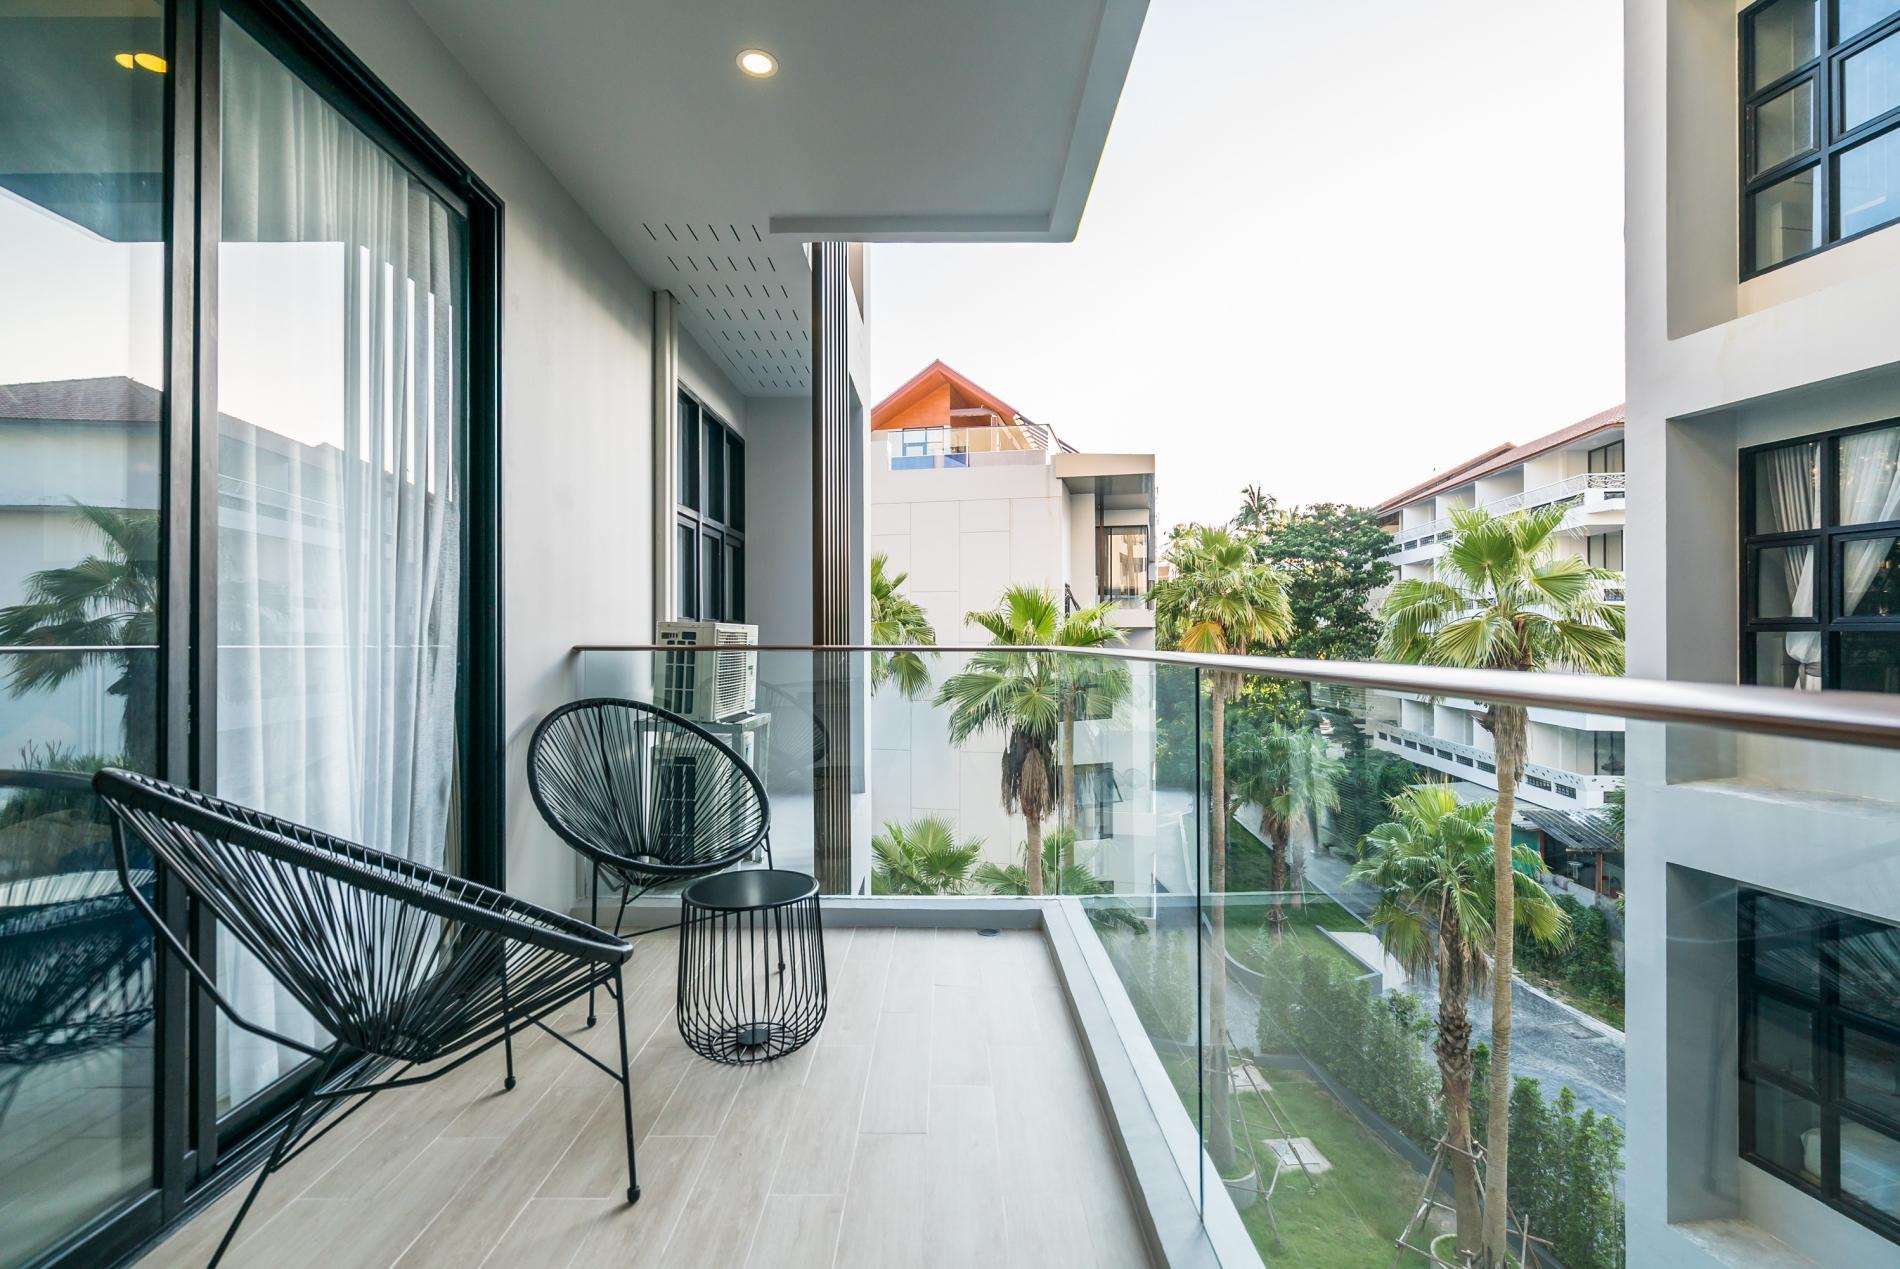 Apartment Palmyrah Surin - 300 meters to the beach    Brand new luxury condo A406 photo 17081795